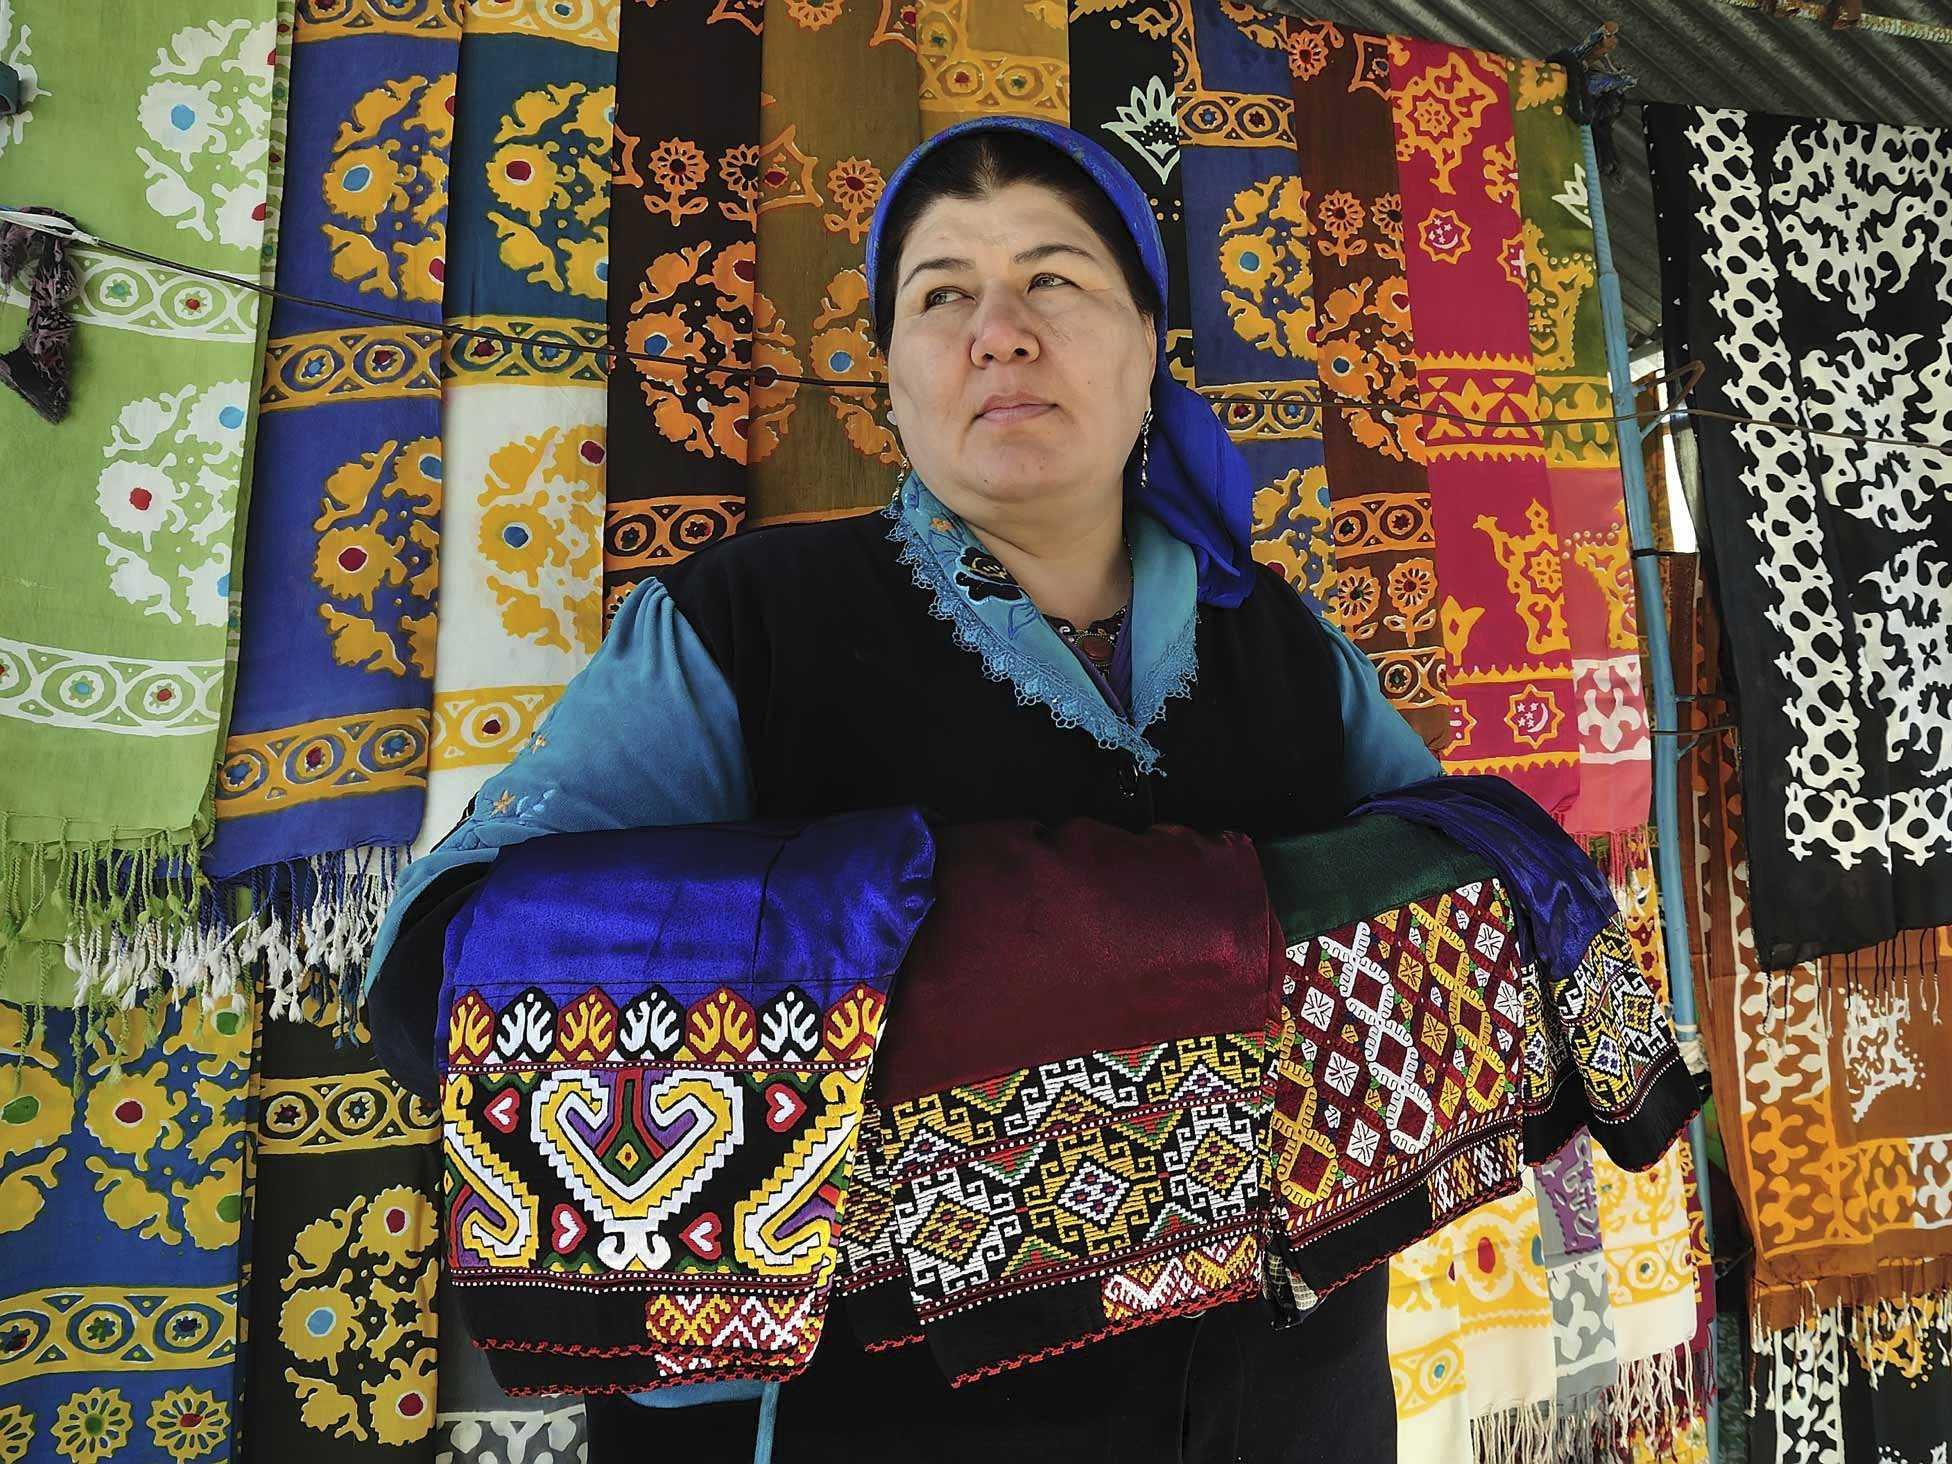 2. Turkmenistan